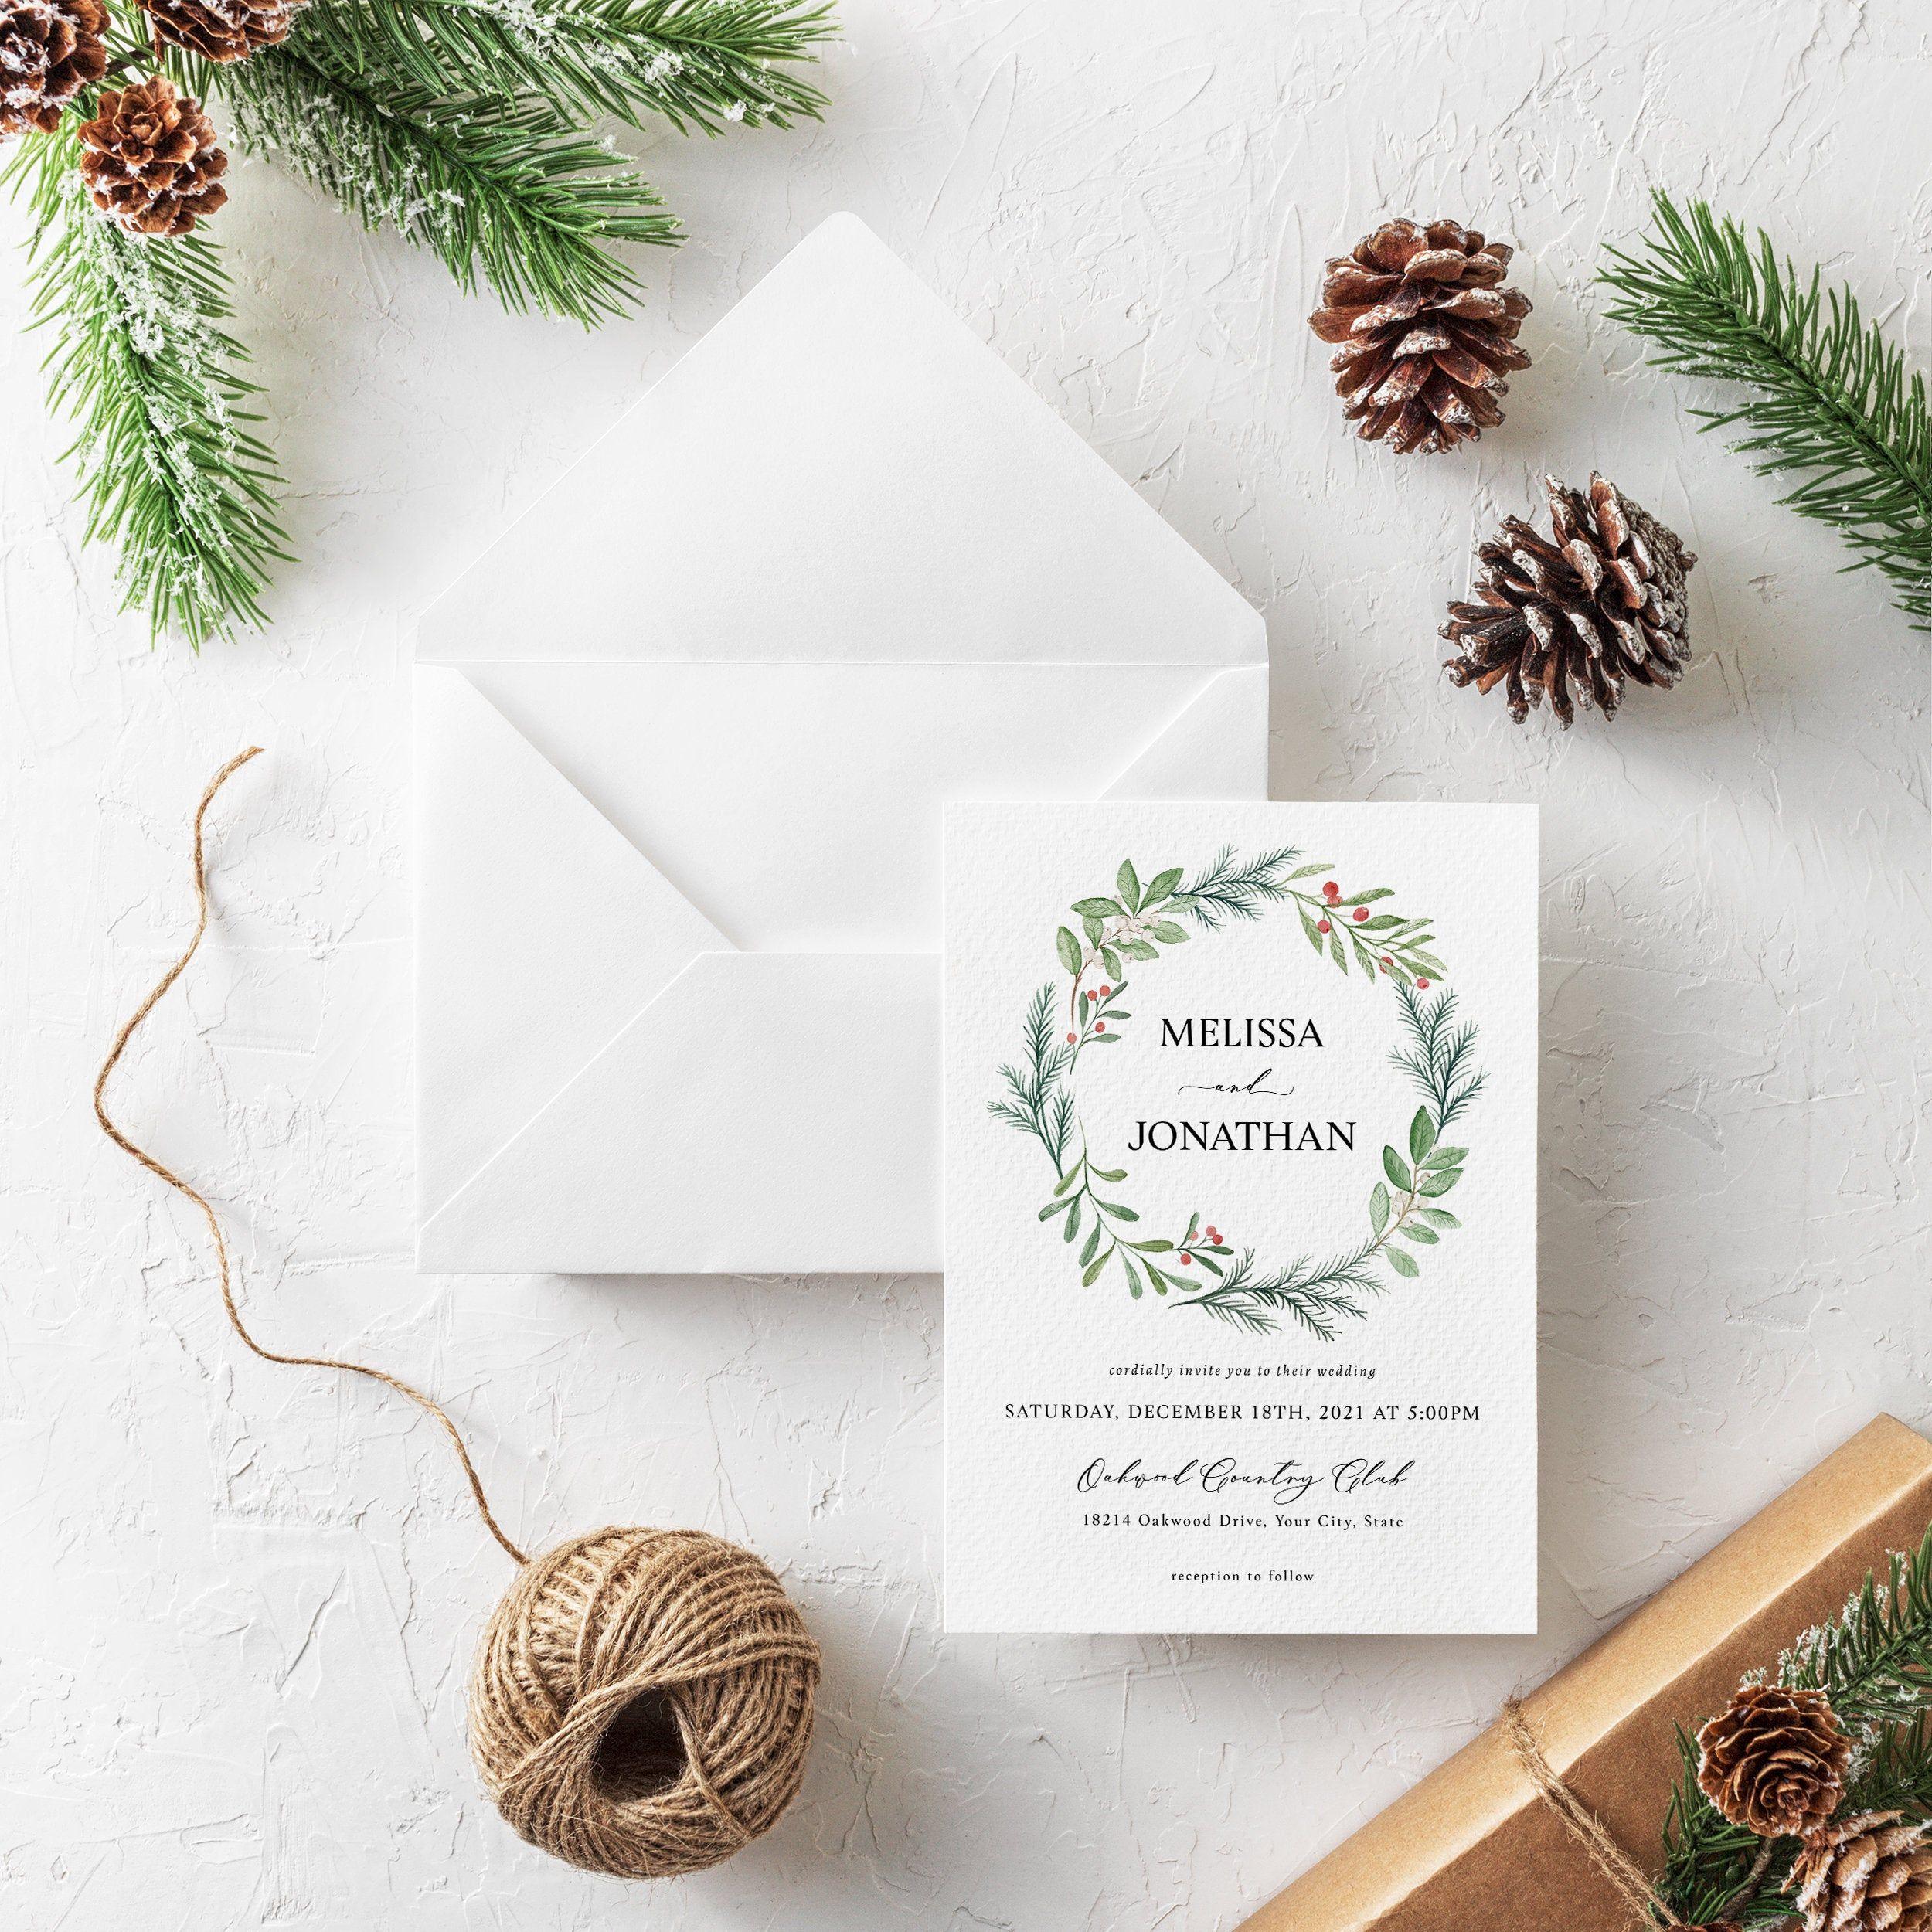 A Wedding For Christmas 2021 Winter Wedding Invitation Christmas Wedding Invite Holiday Etsy In 2021 Printable Holiday Card Christmas Card Template Christmas Photo Cards